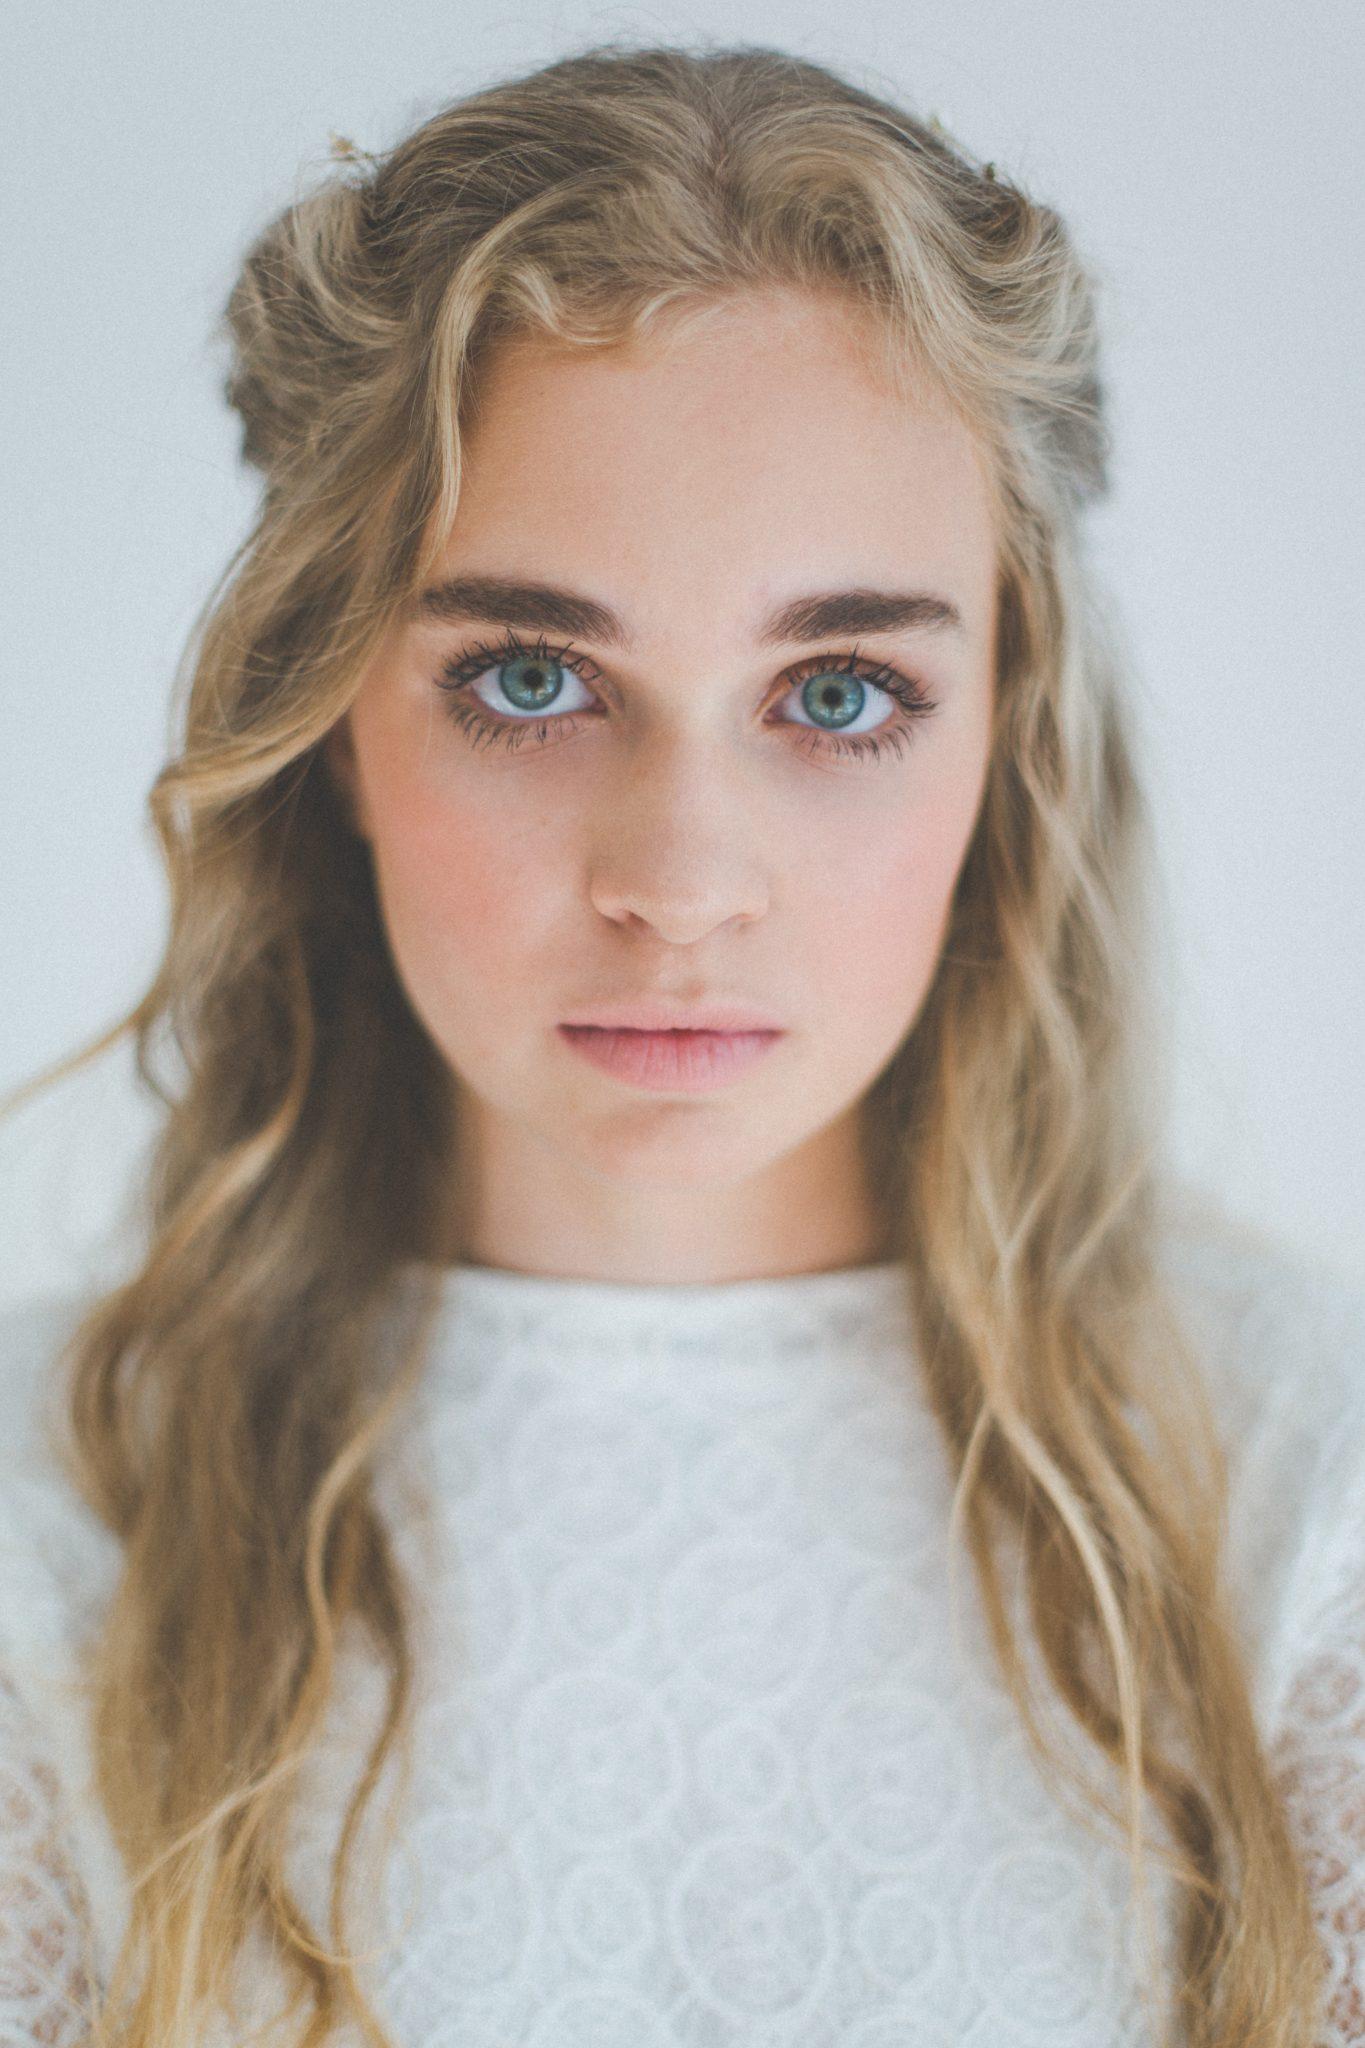 Sara hair_make-up_muenchen_zuzanna_grabias_hajsajs